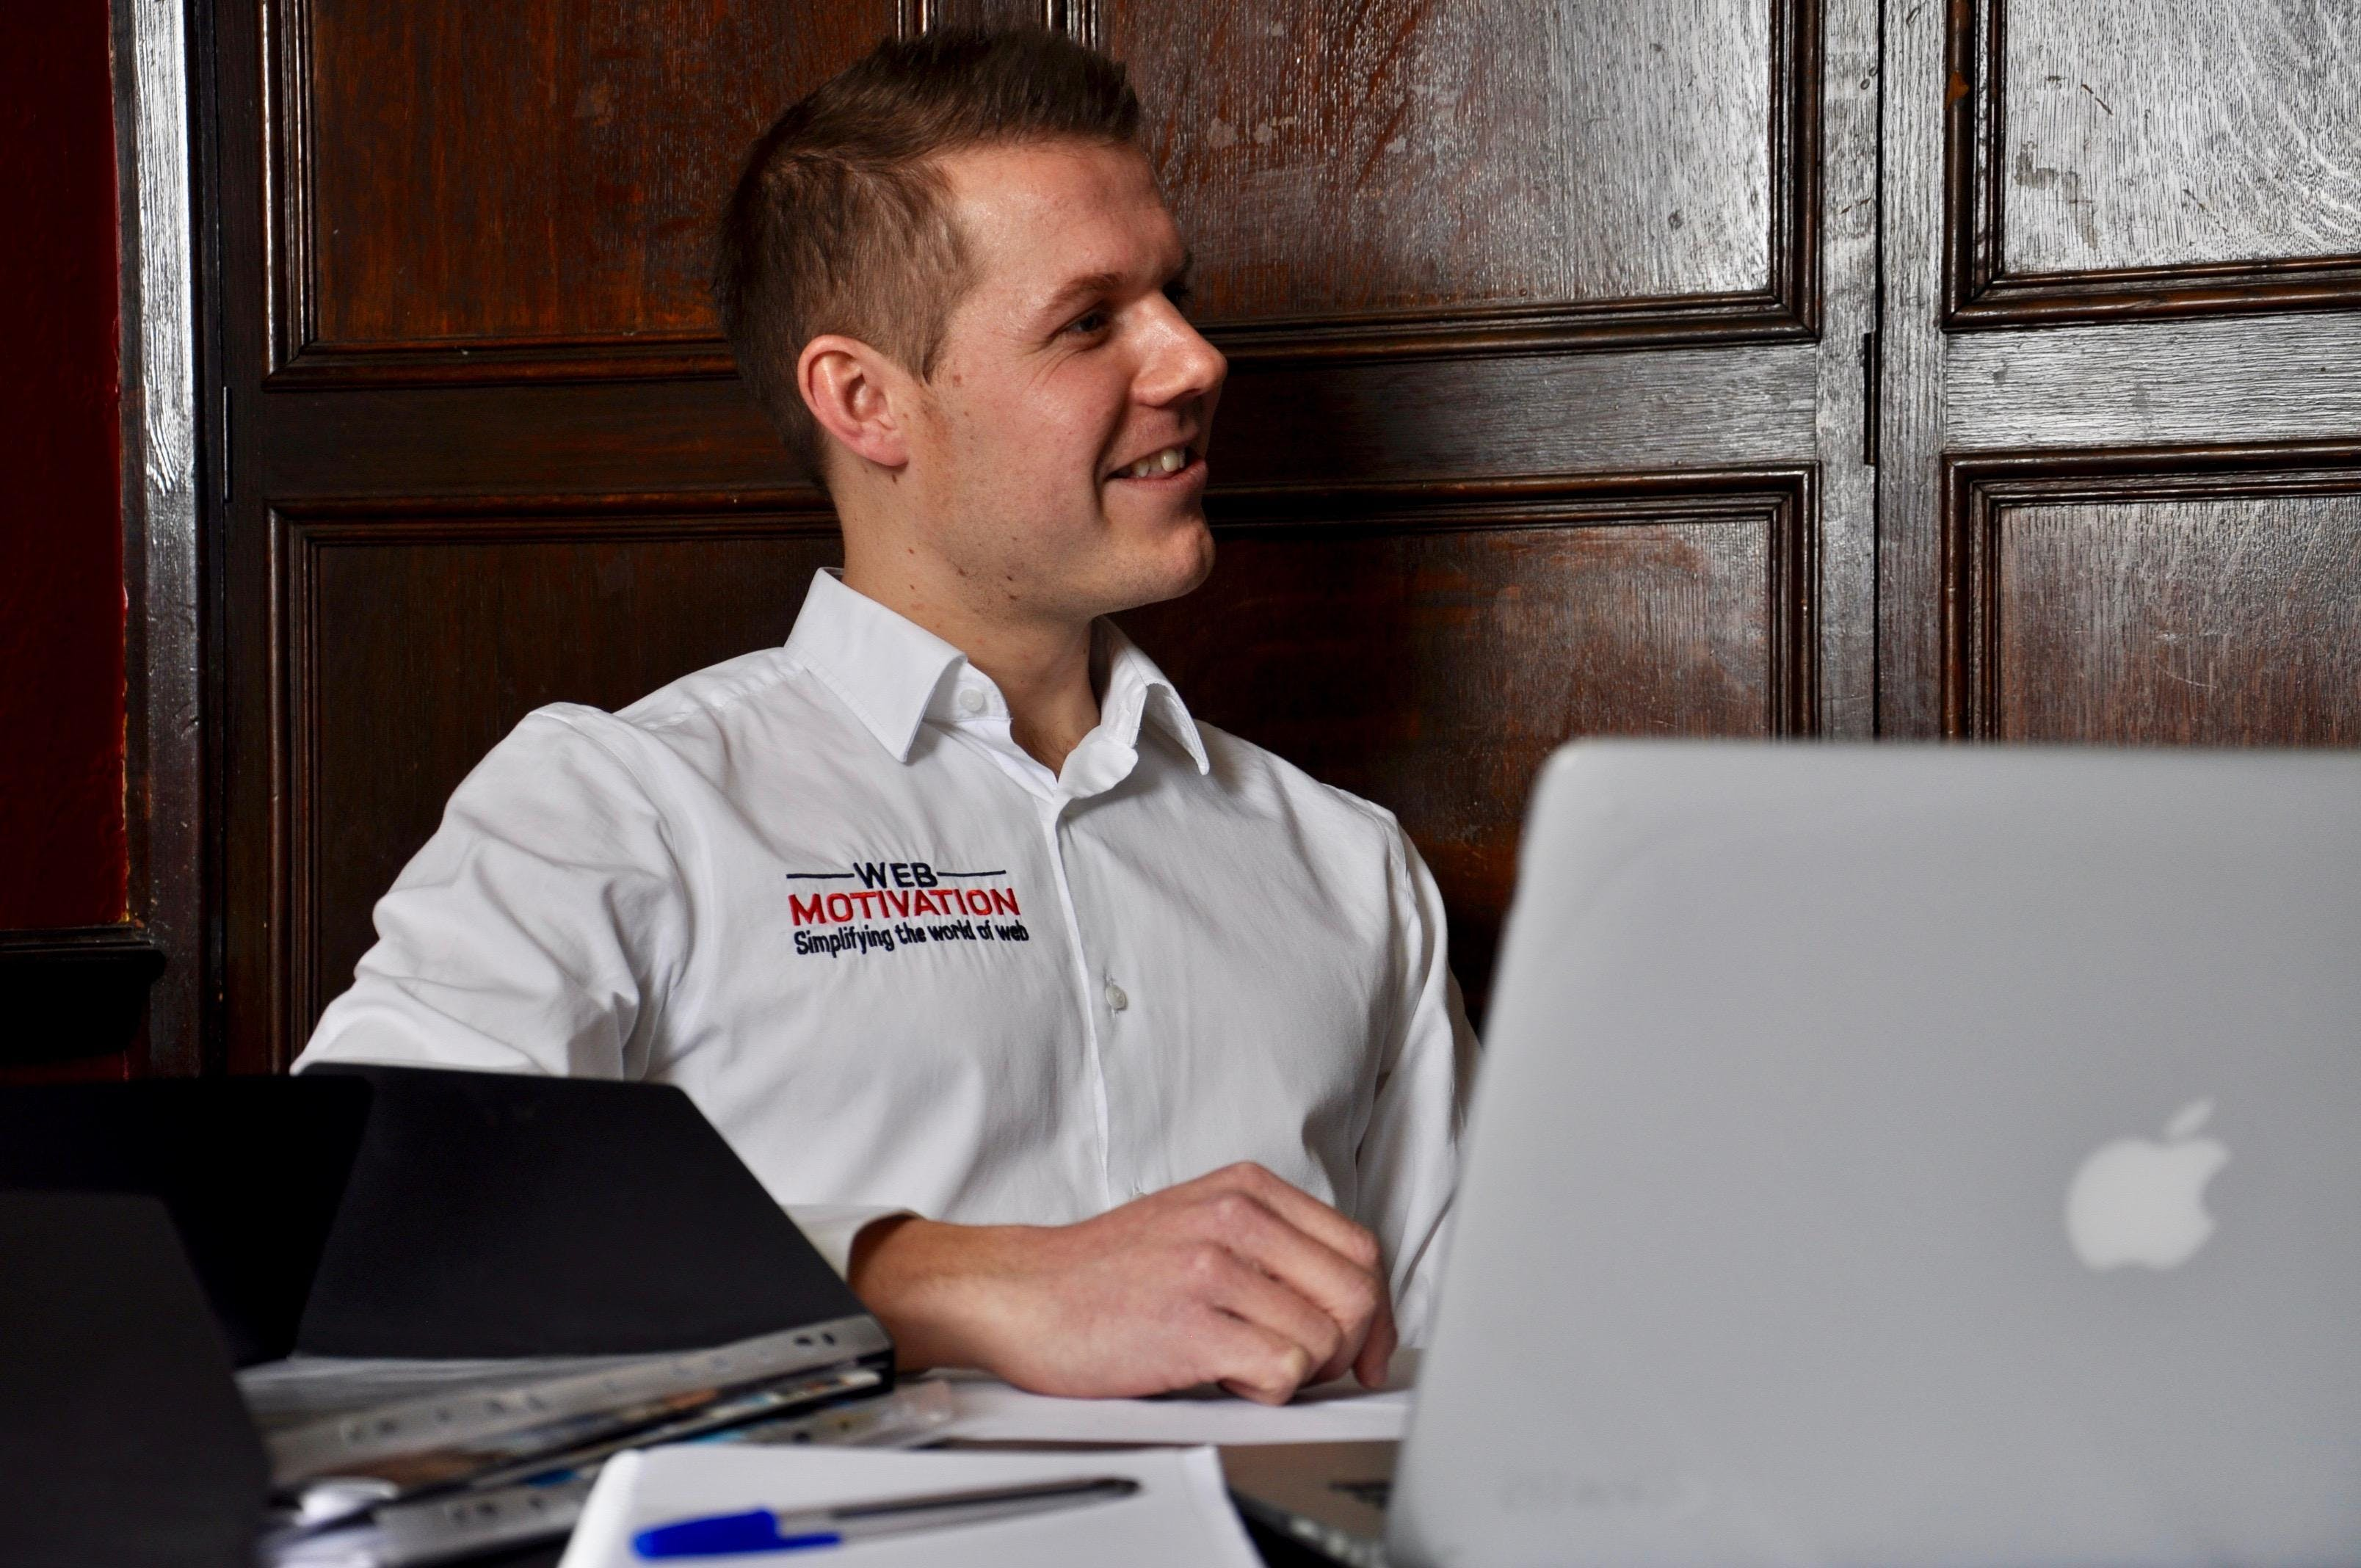 Croydon WordPress & Digital Marketing Knowledge Clinics: